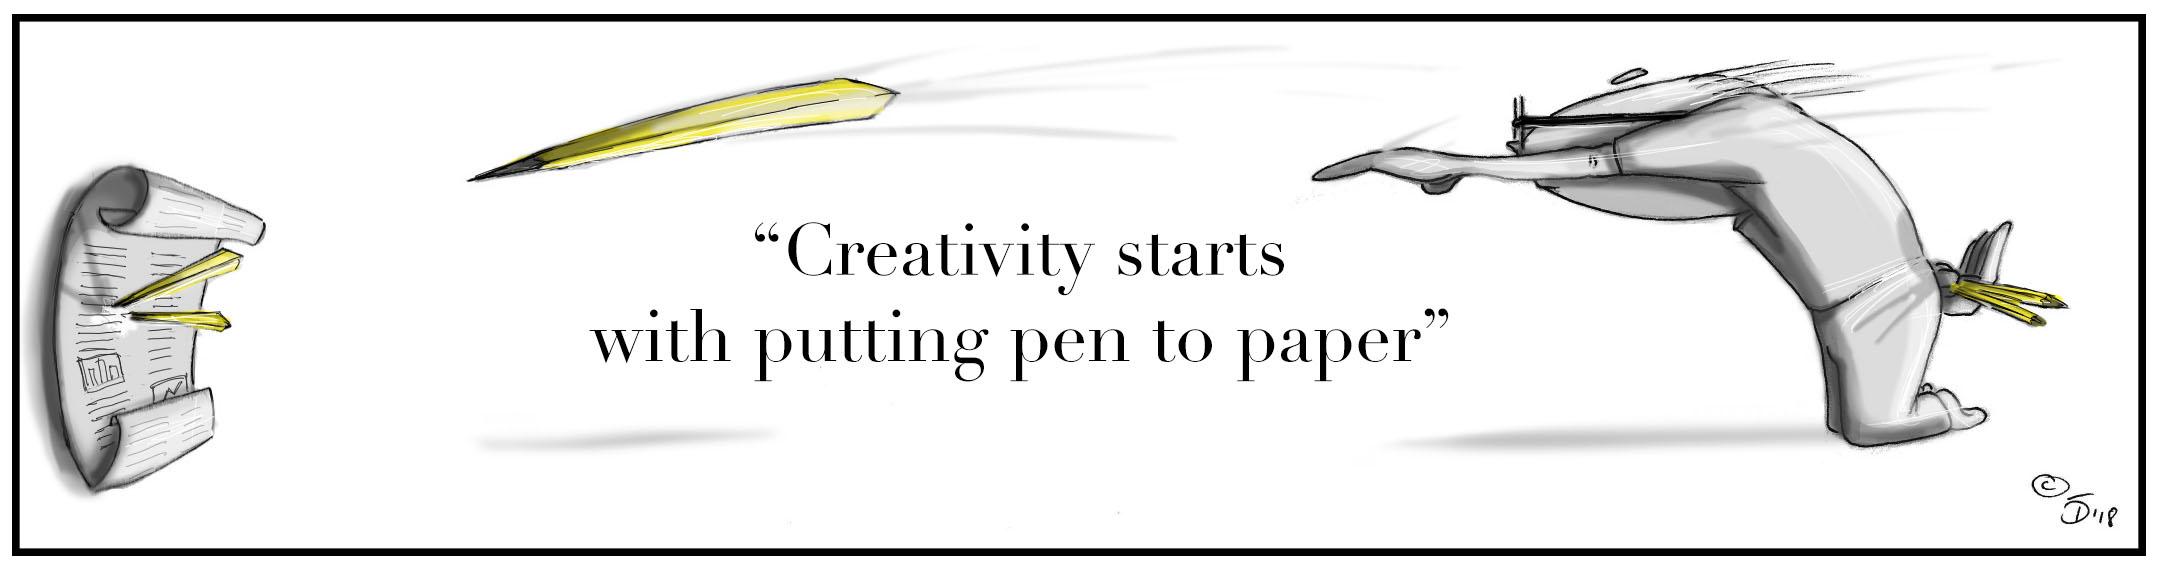 """Creativity Starts"" by Tom Deisboeck"